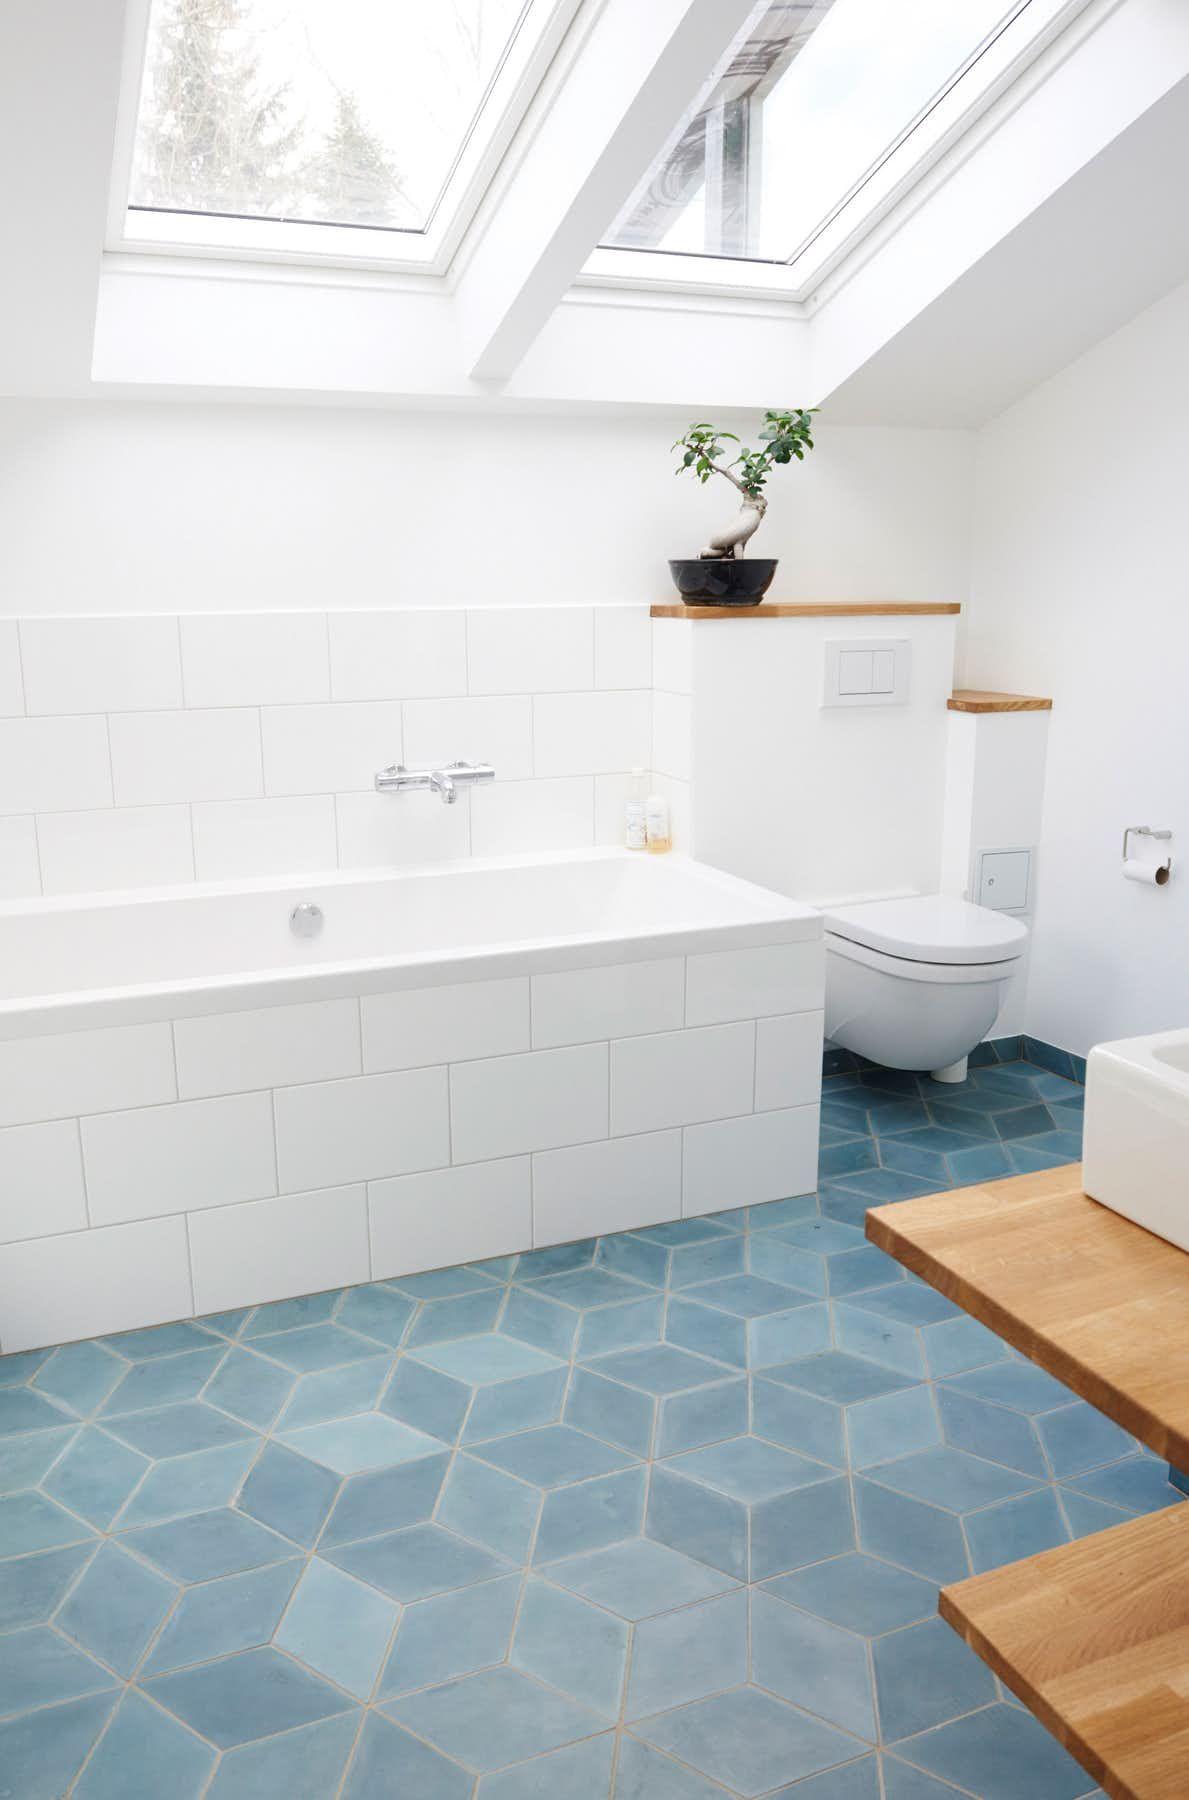 Marokkansk inspiration | Home sweet bathroom | Pinterest | Bath, Kid ...